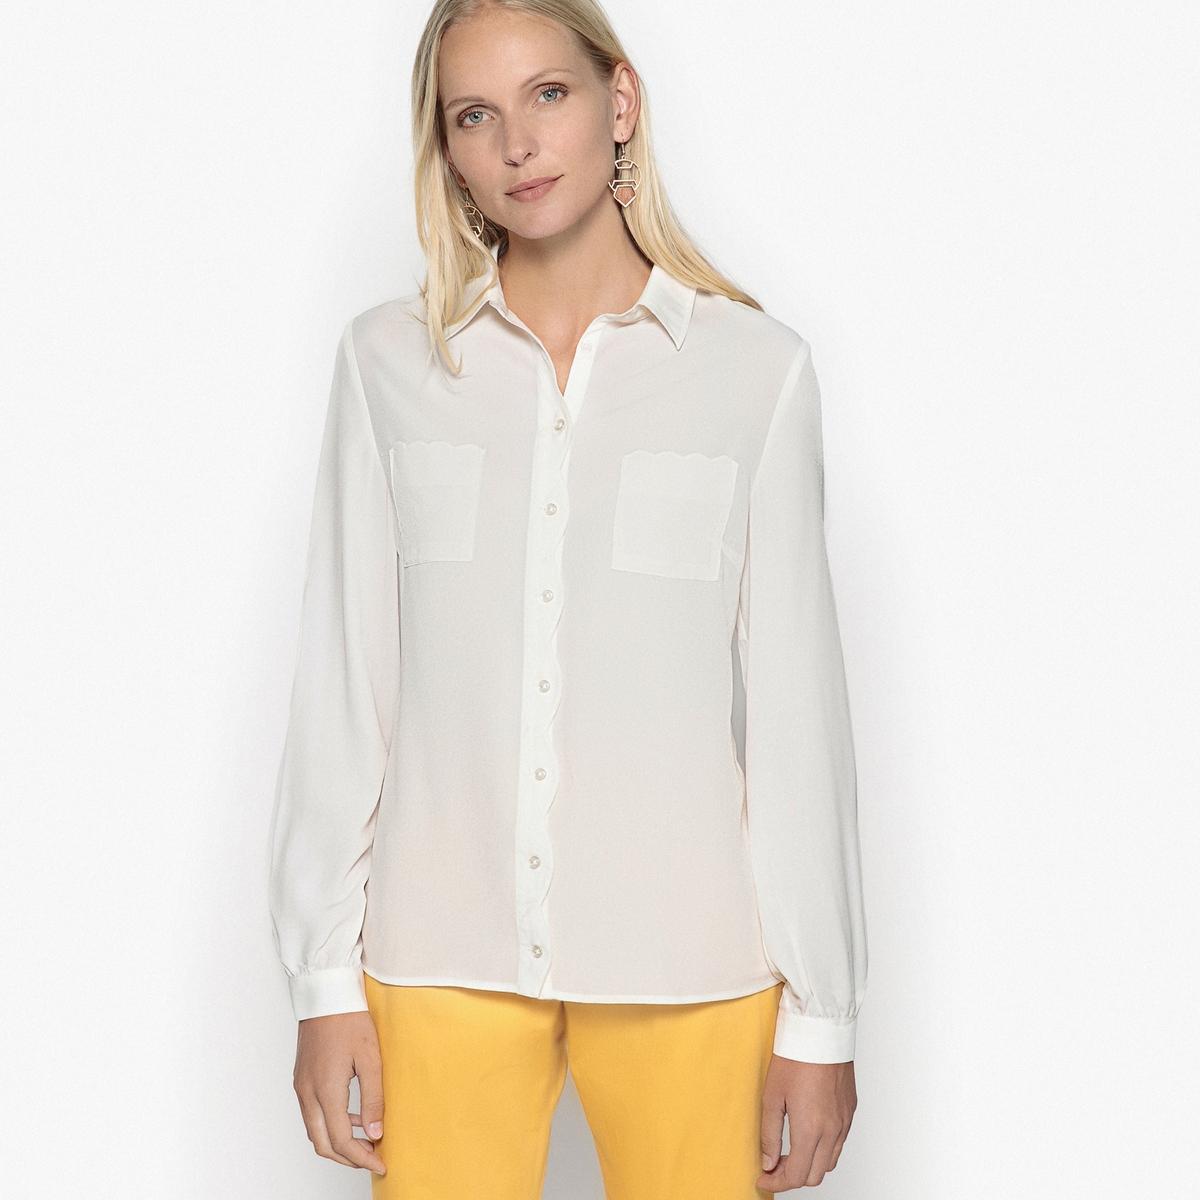 Camisa em crepe, mangas compridas